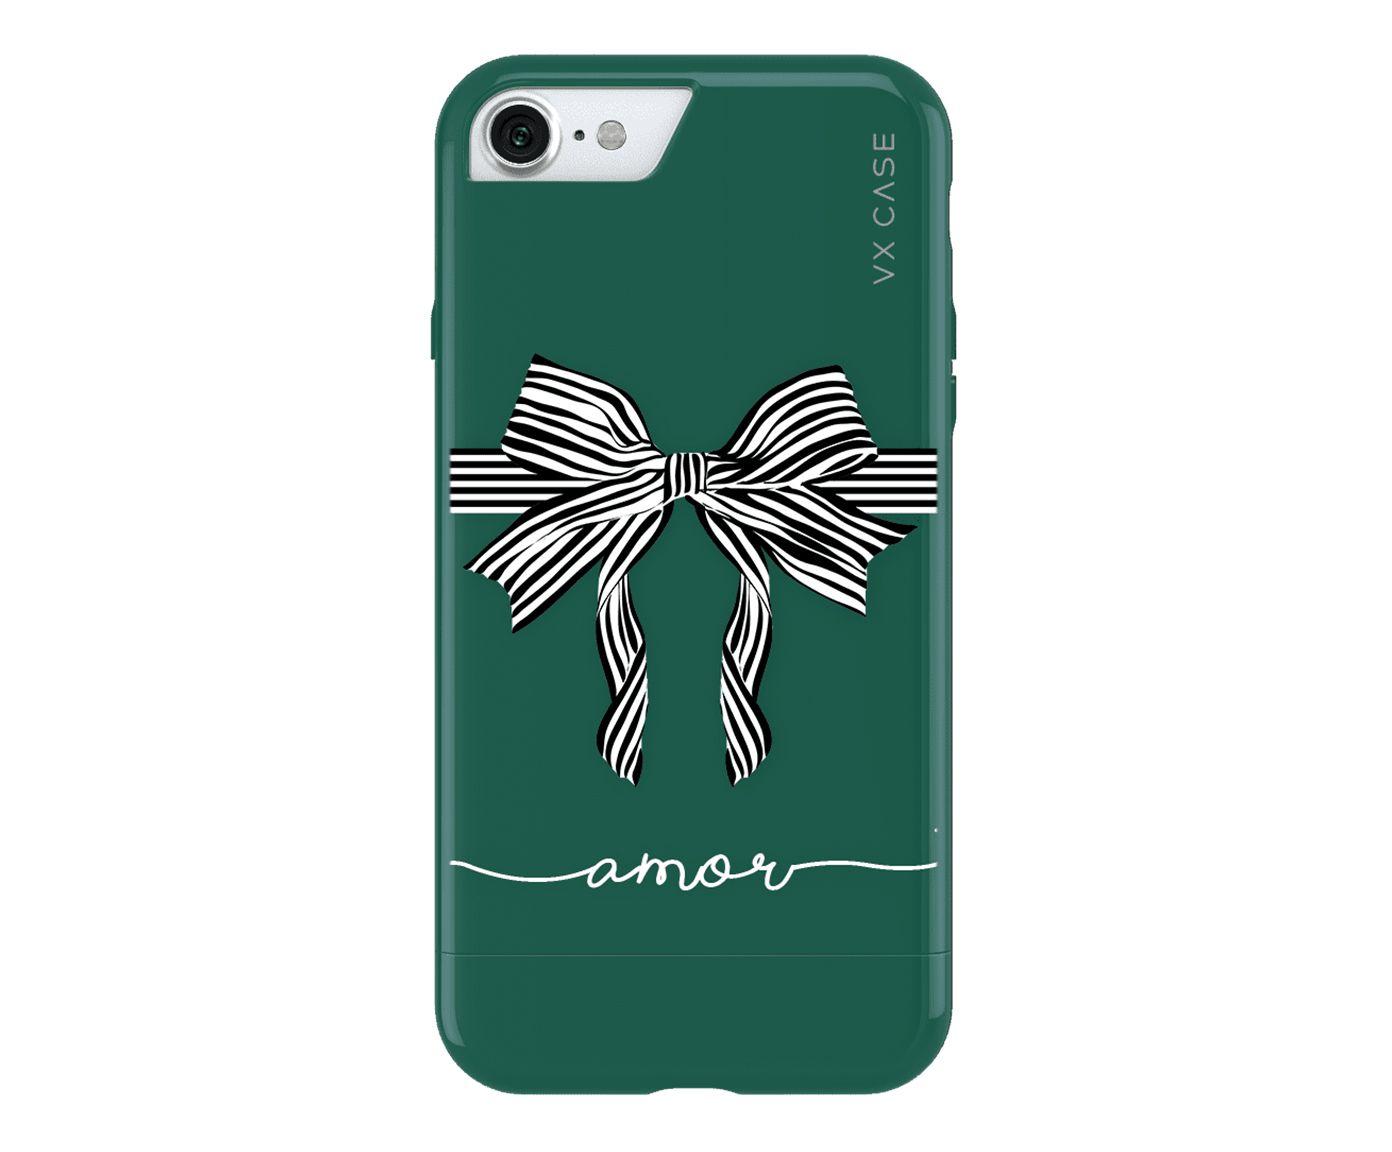 Capa Envernizada Vx Case Iphone 11 Pro Max Friendship